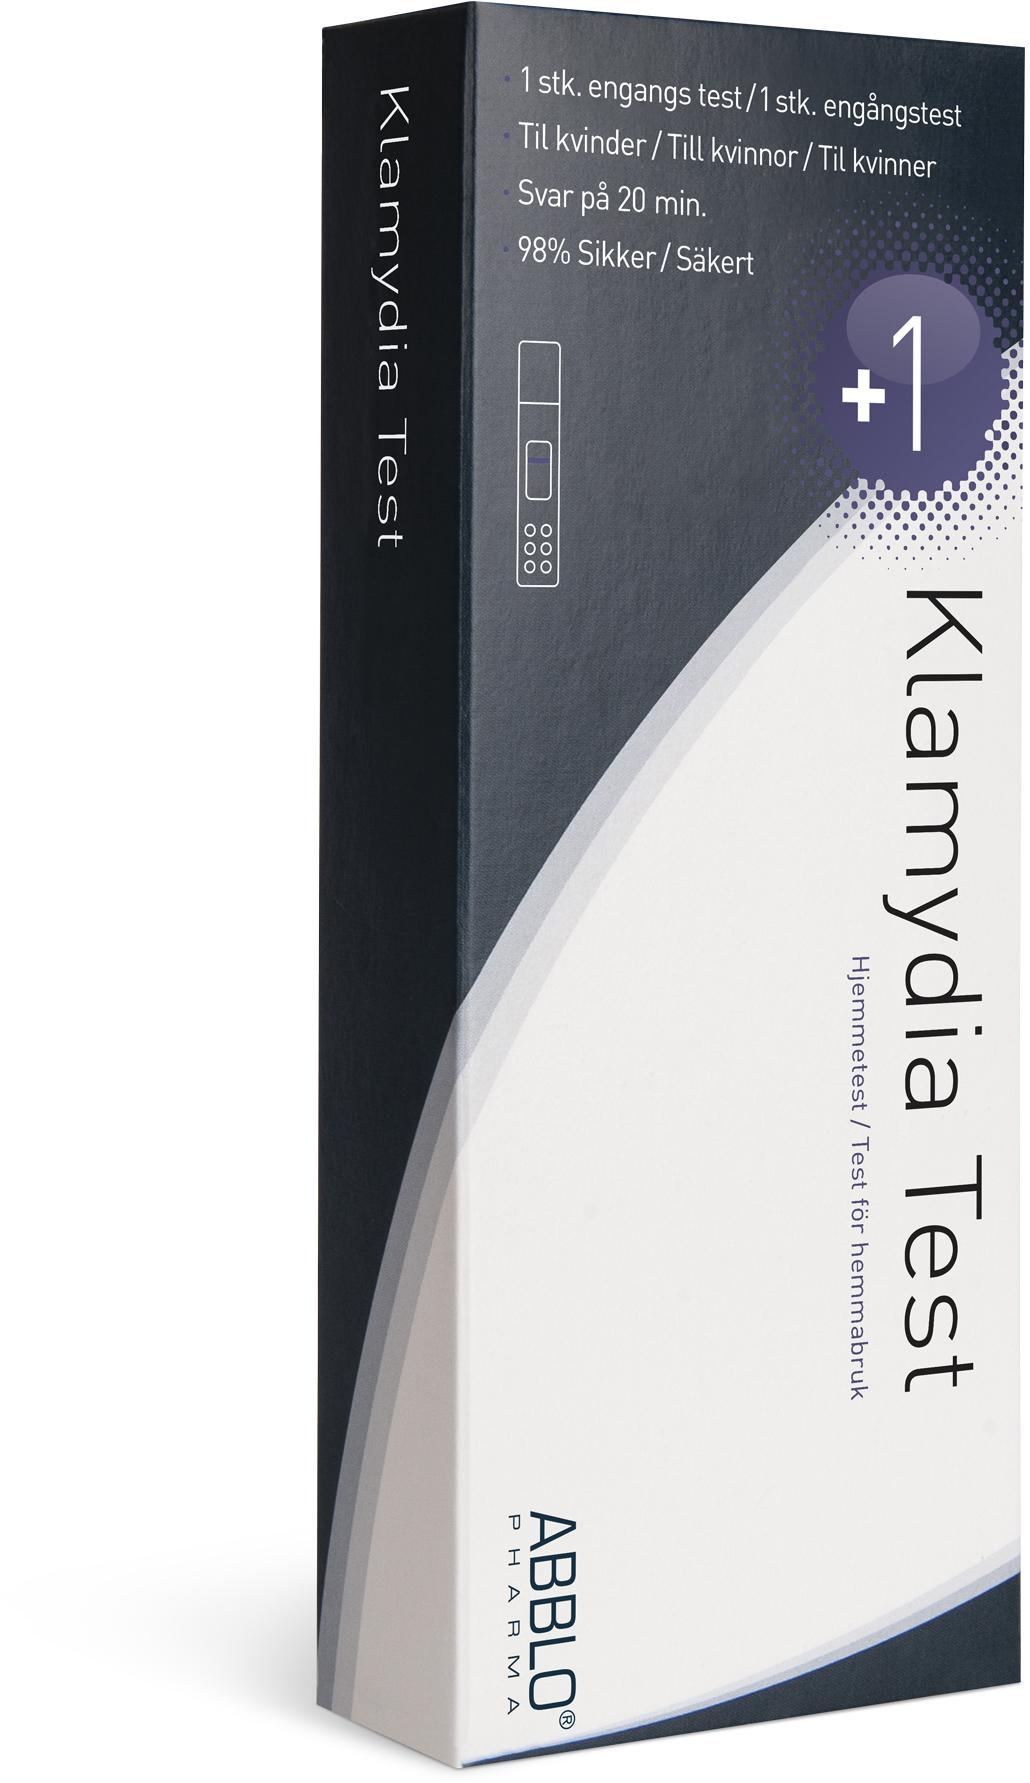 klamydia test københavn